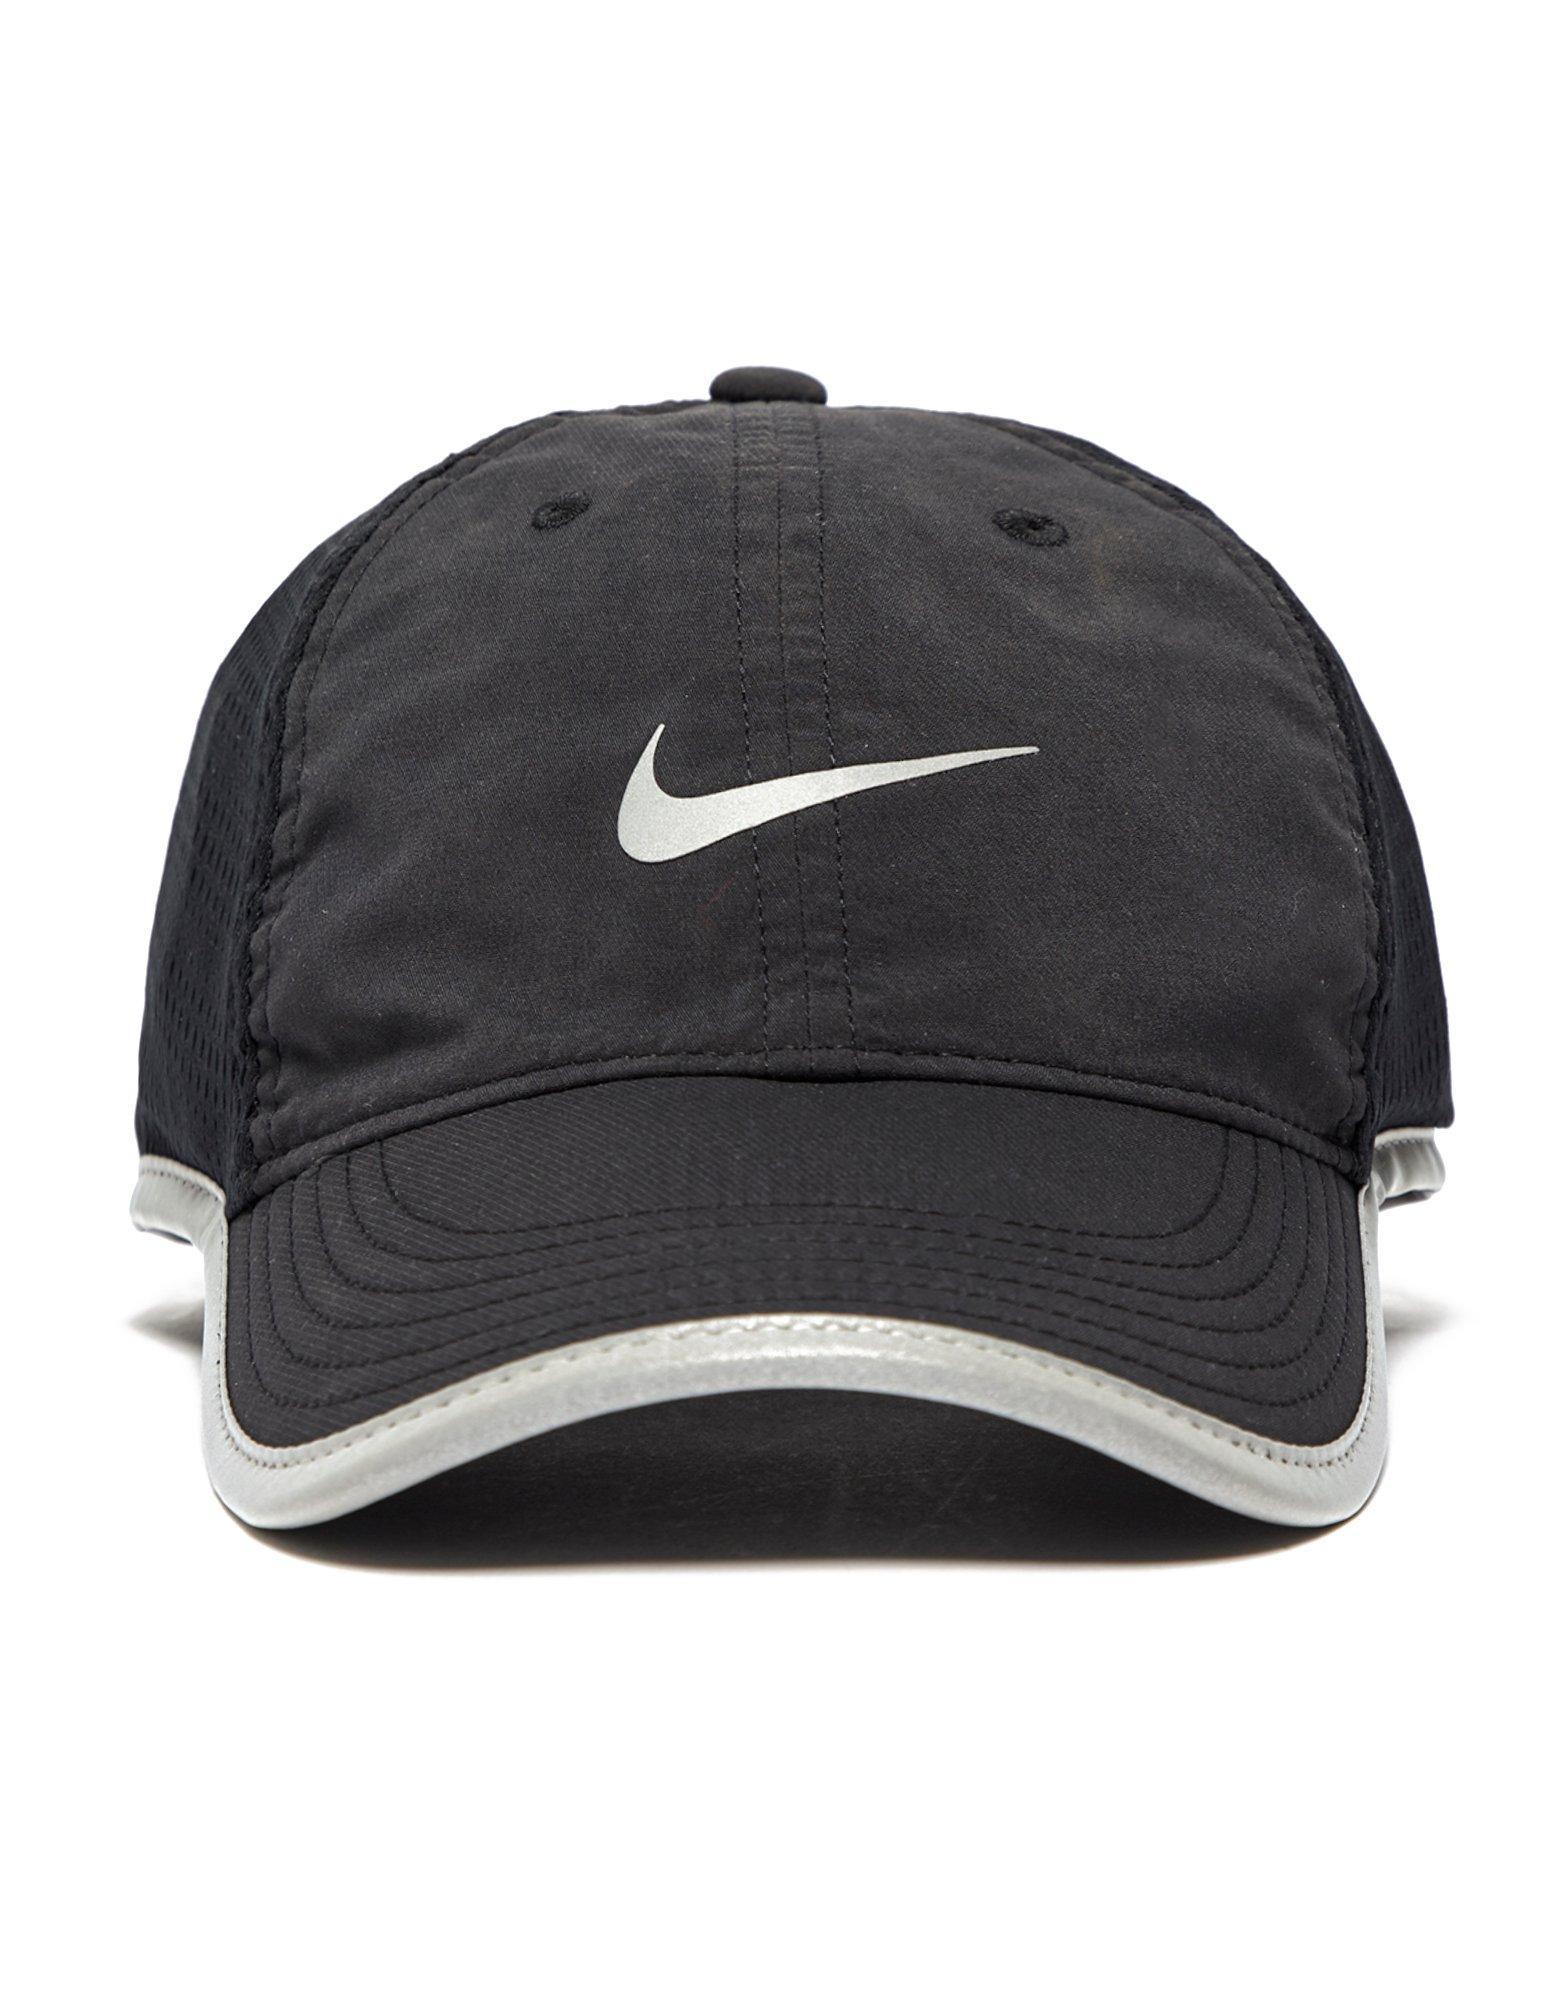 Lyst - Nike Knit Mesh Running Cap in Black for Men ee318ad402f